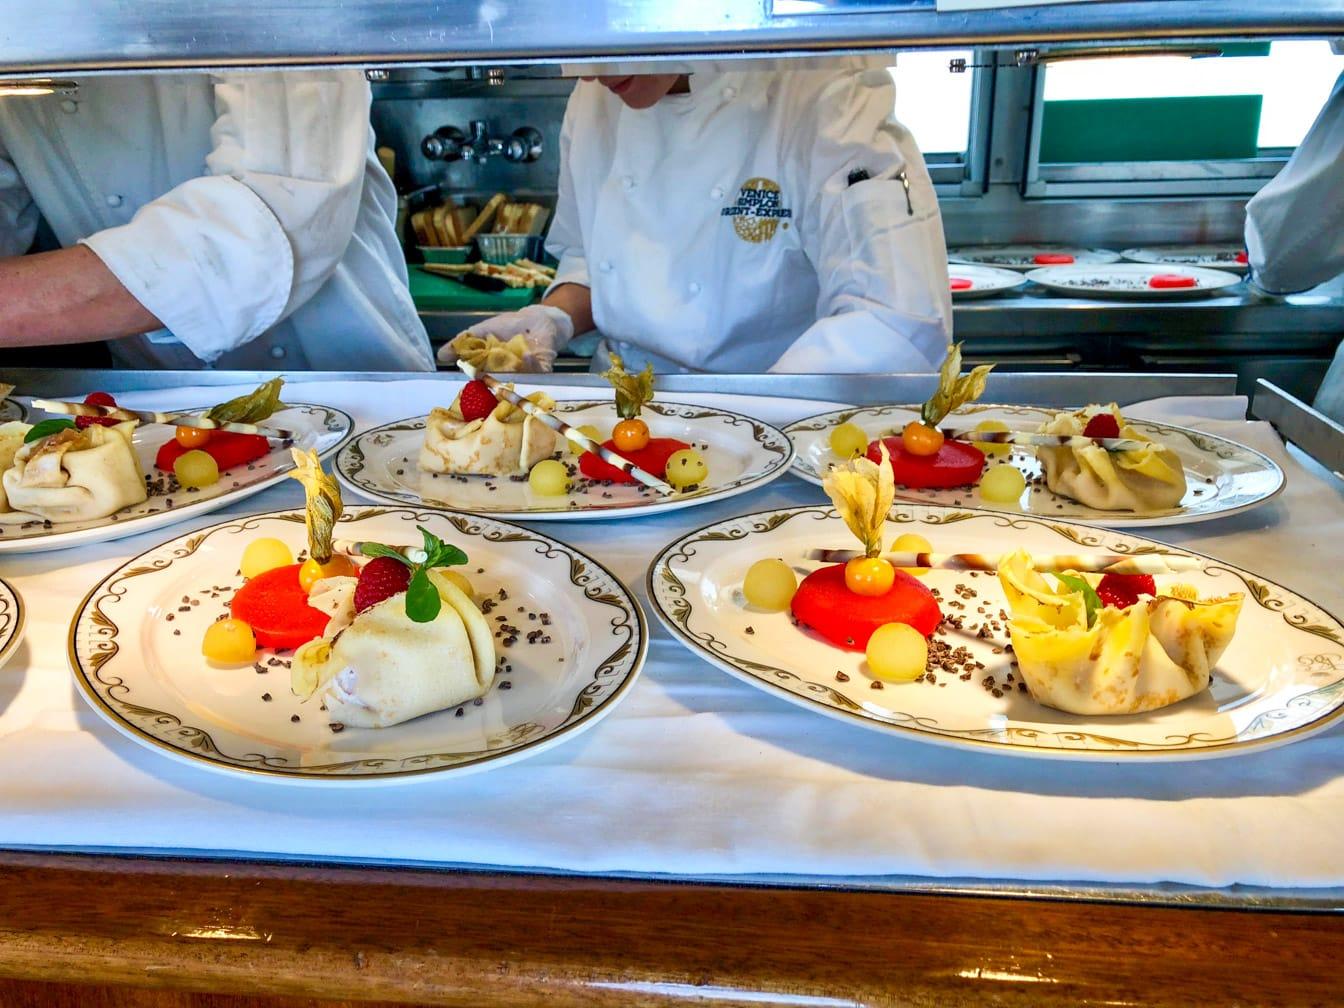 Preparing meals in the Venice Simplon-Orient-Express (VSOE) train